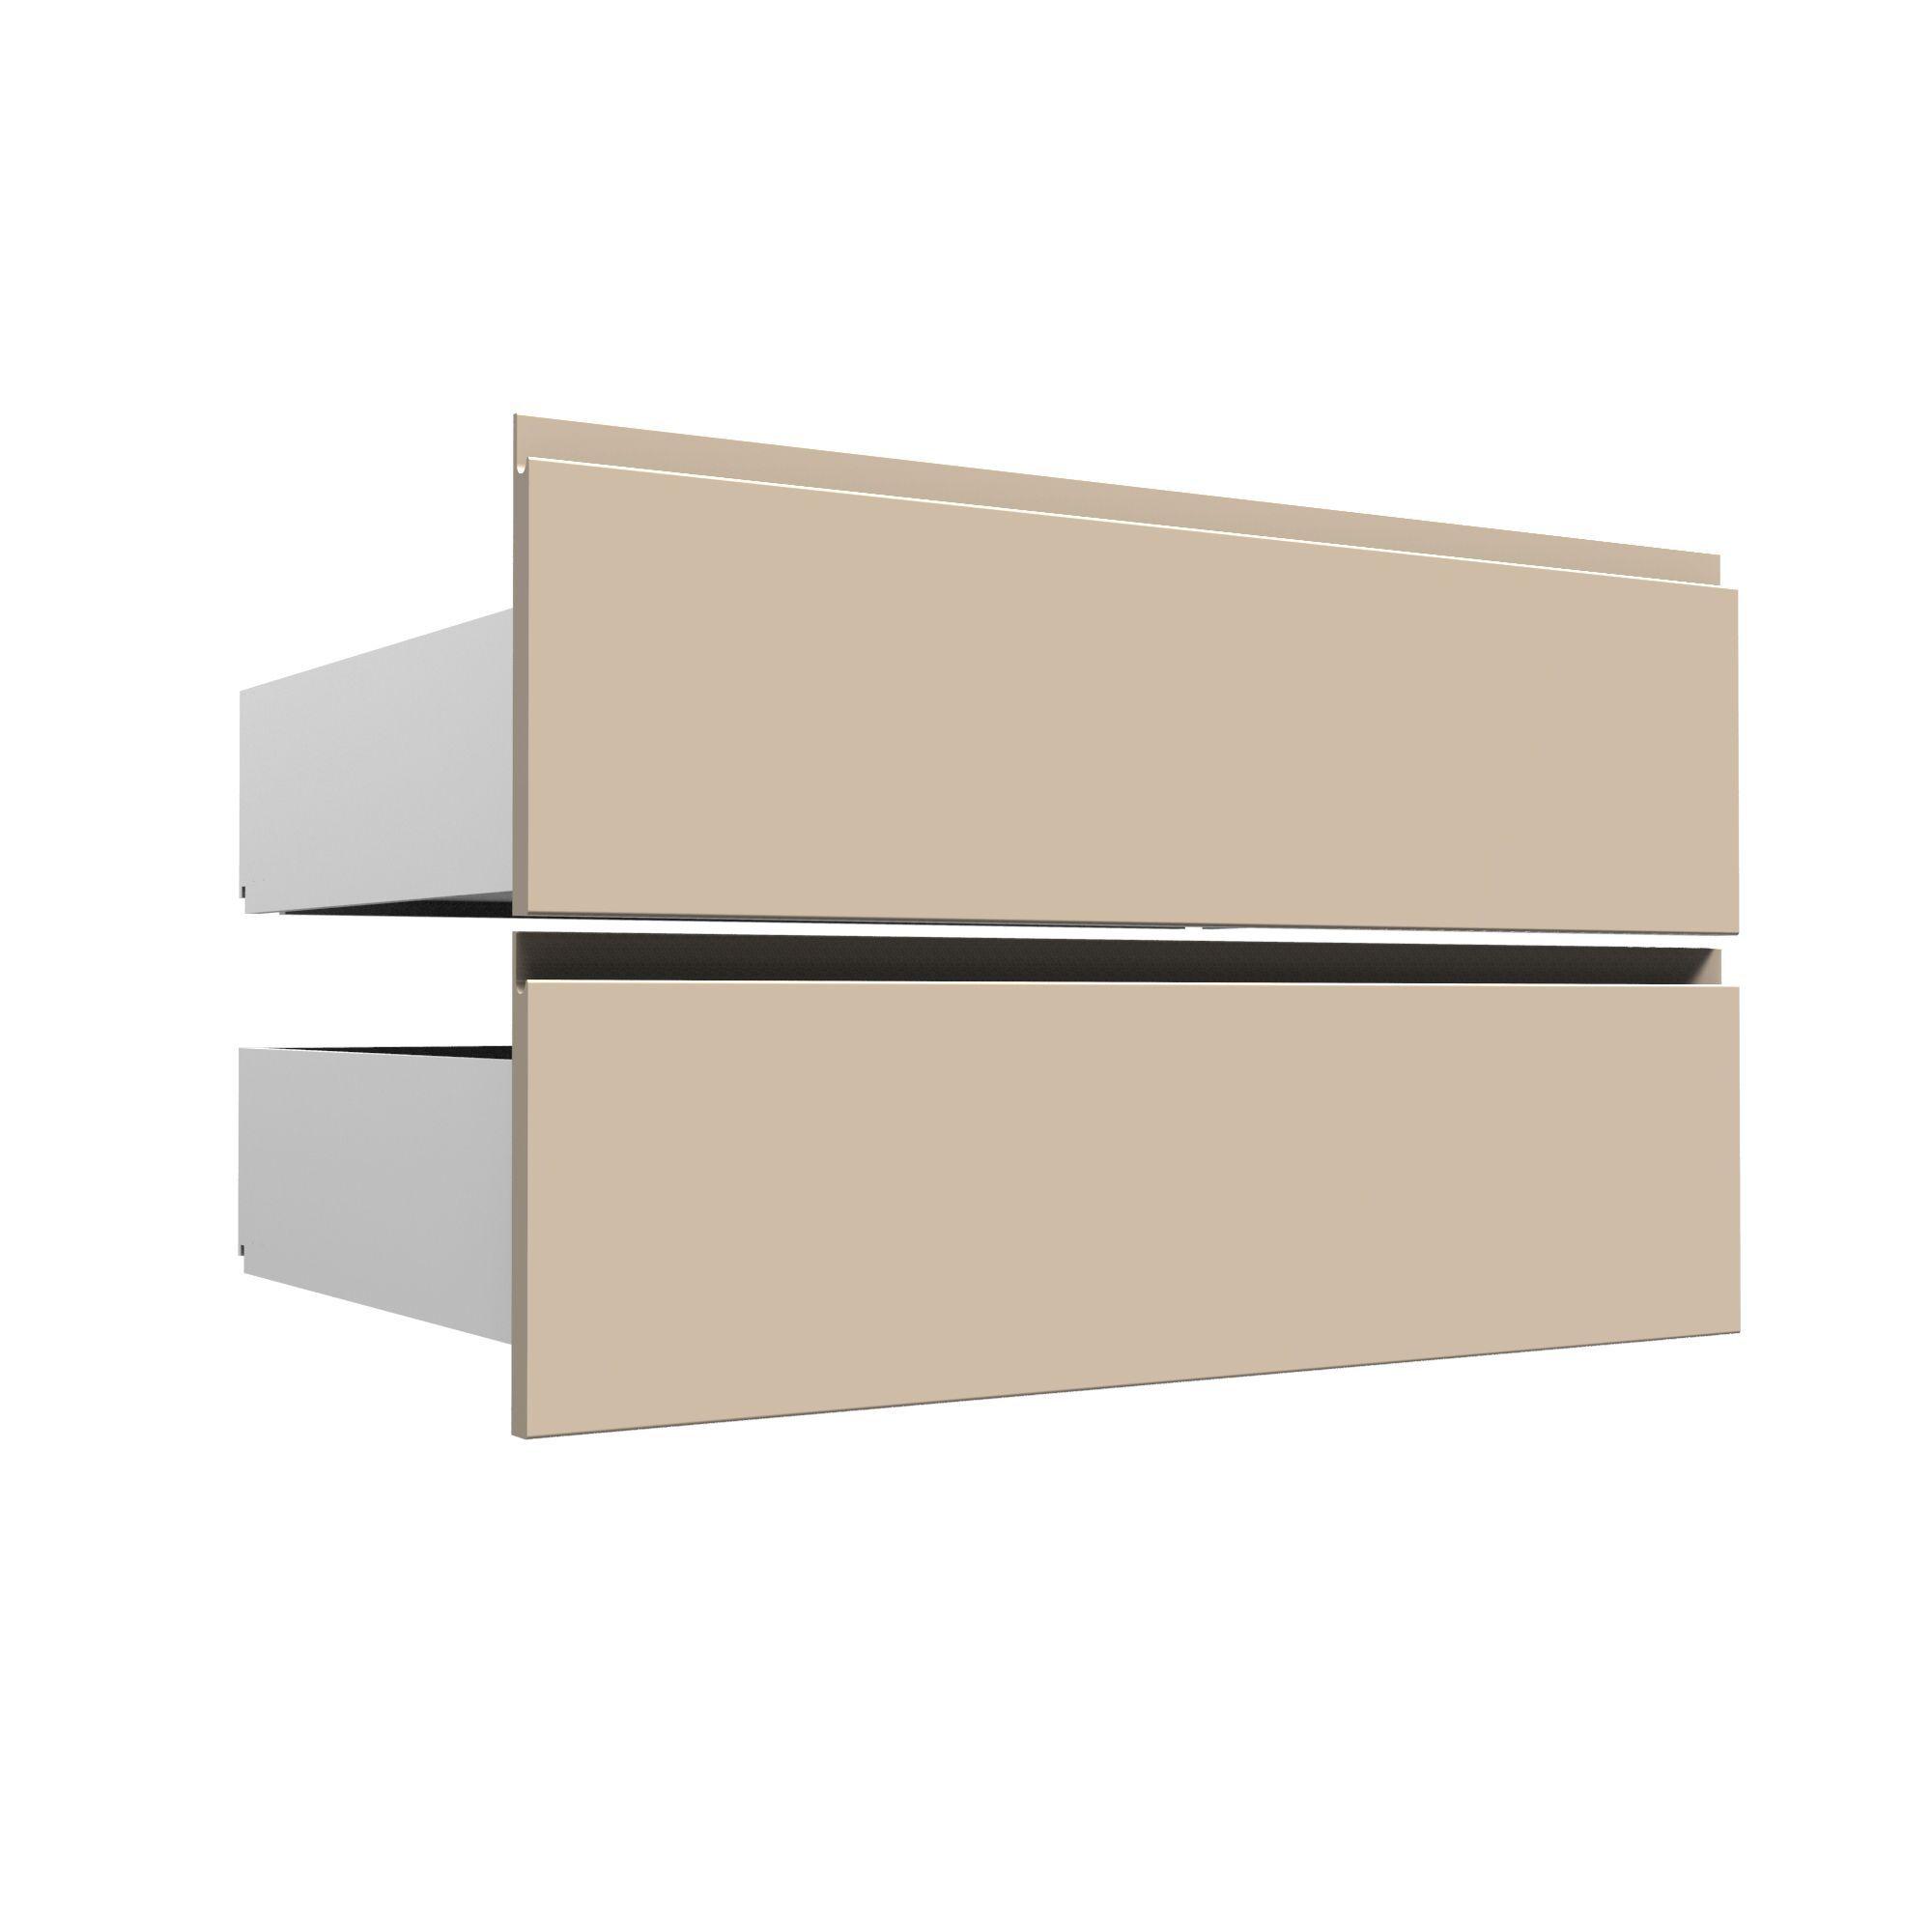 Darwin Modular Cream Drawer (h)240mm (w)750mm (d)566mm